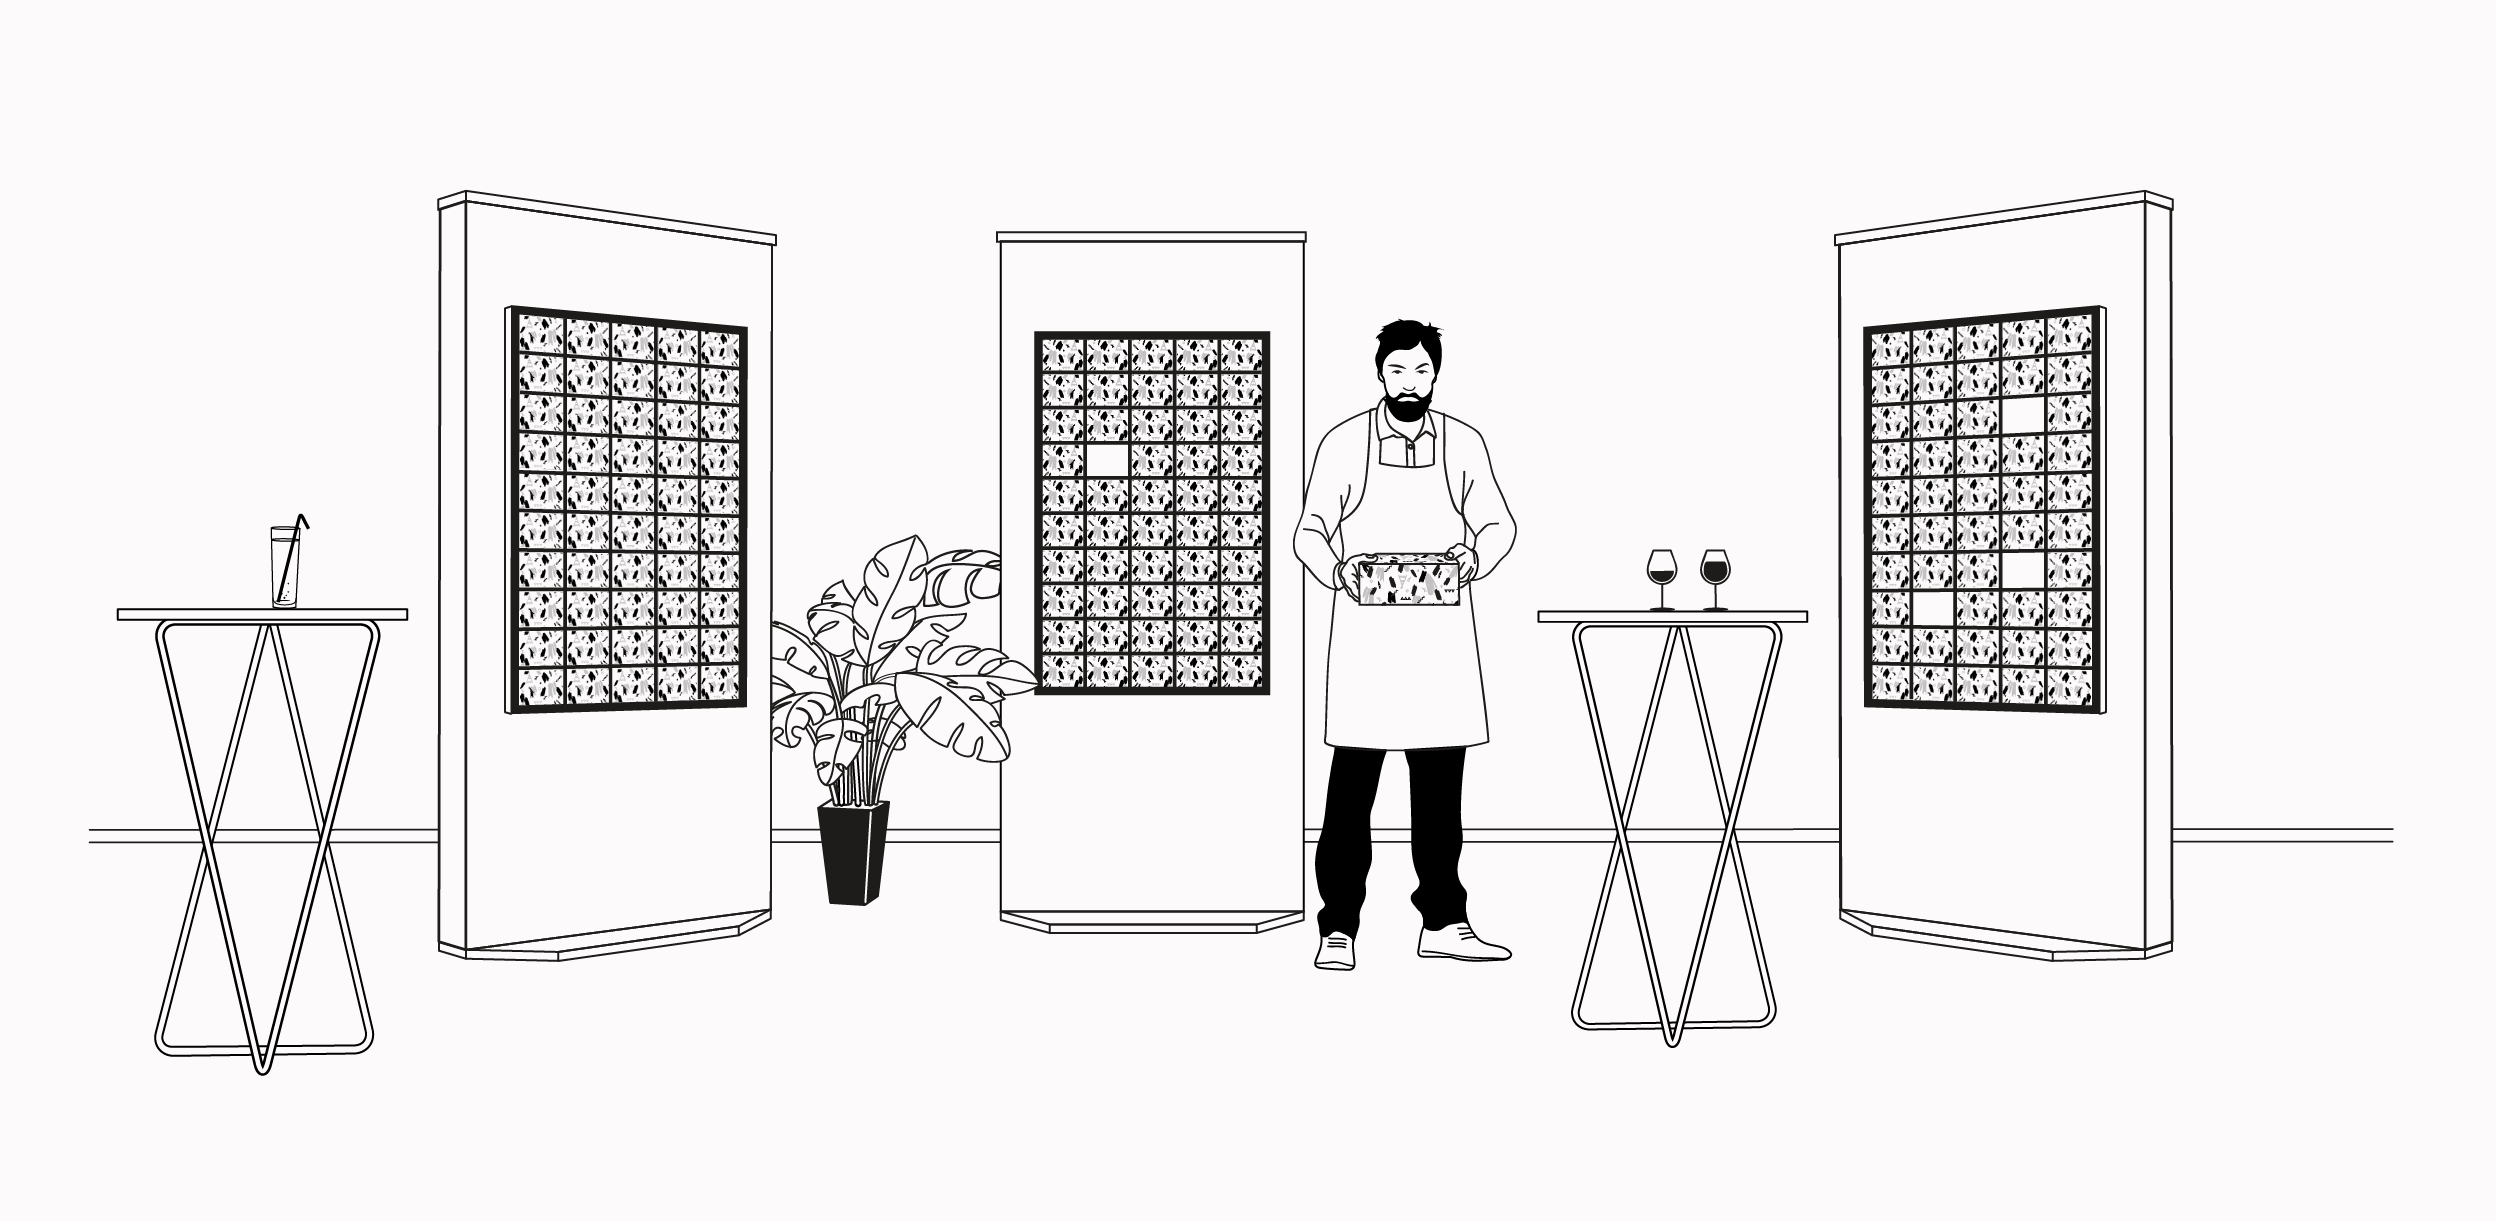 Vlevle_EatingPoint_Catering_Illustration-express.png